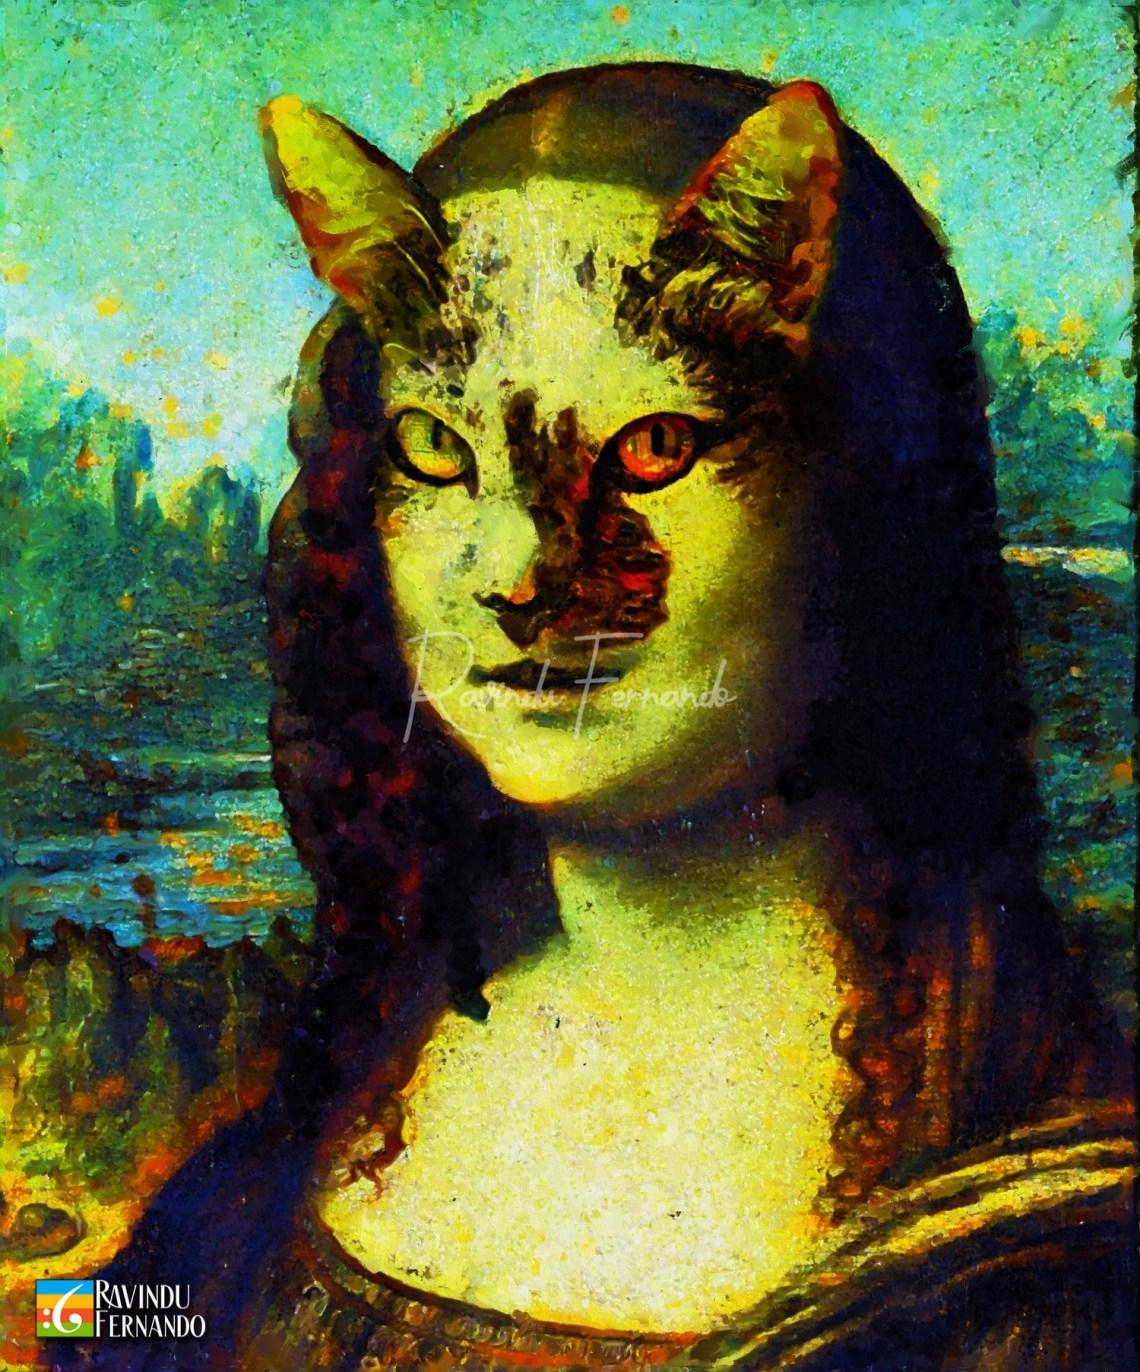 Monaliza Cat - Digital Oil Painting By Ravindu Fernando